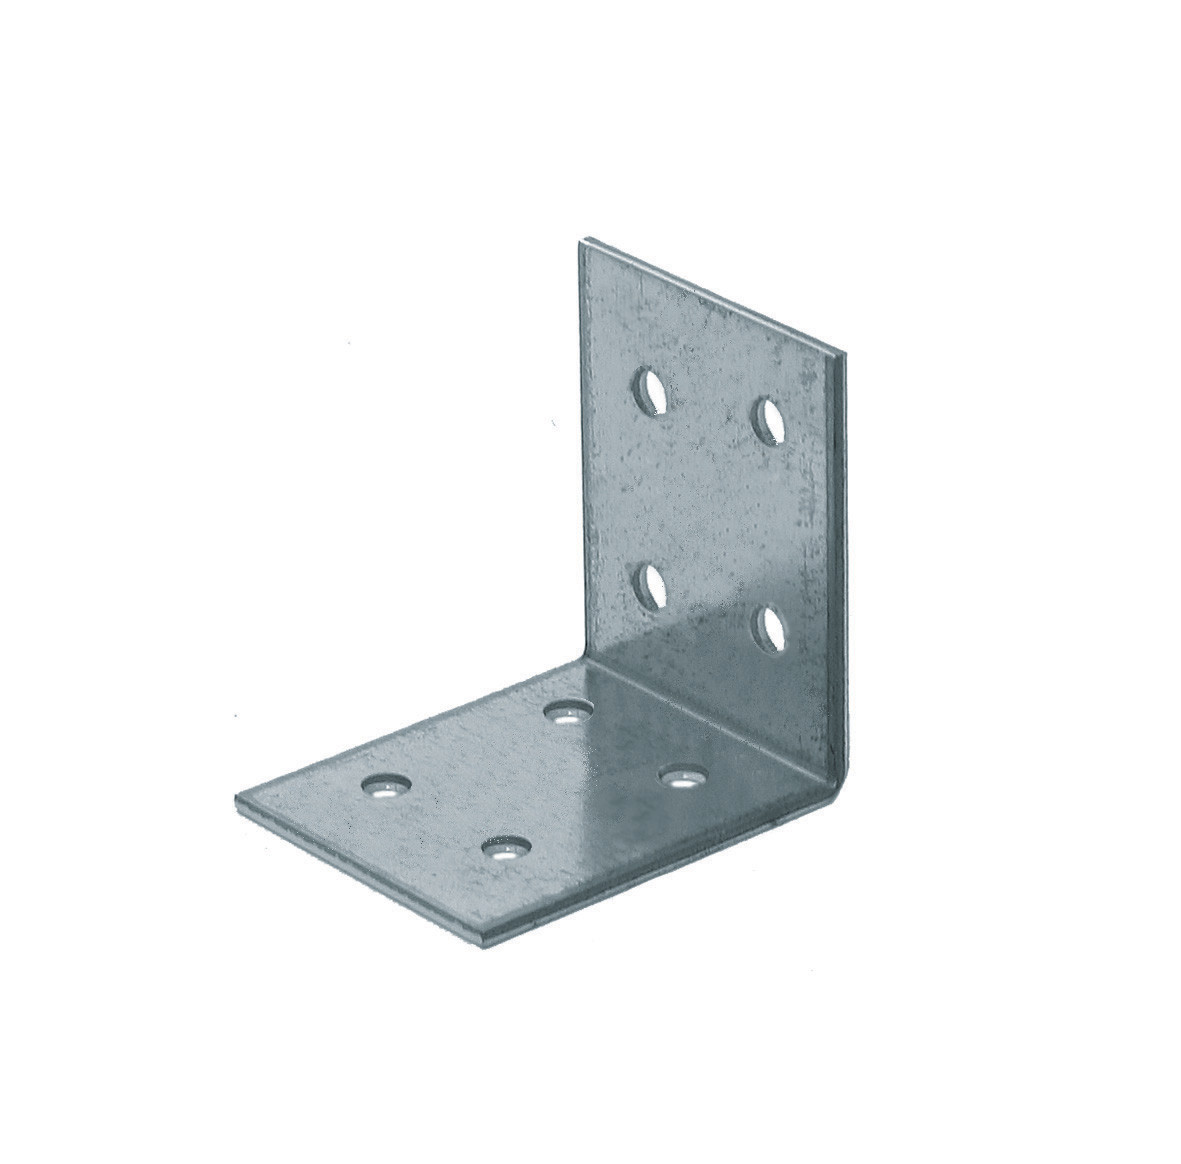 Frame connector 50x50 40x2 ZM